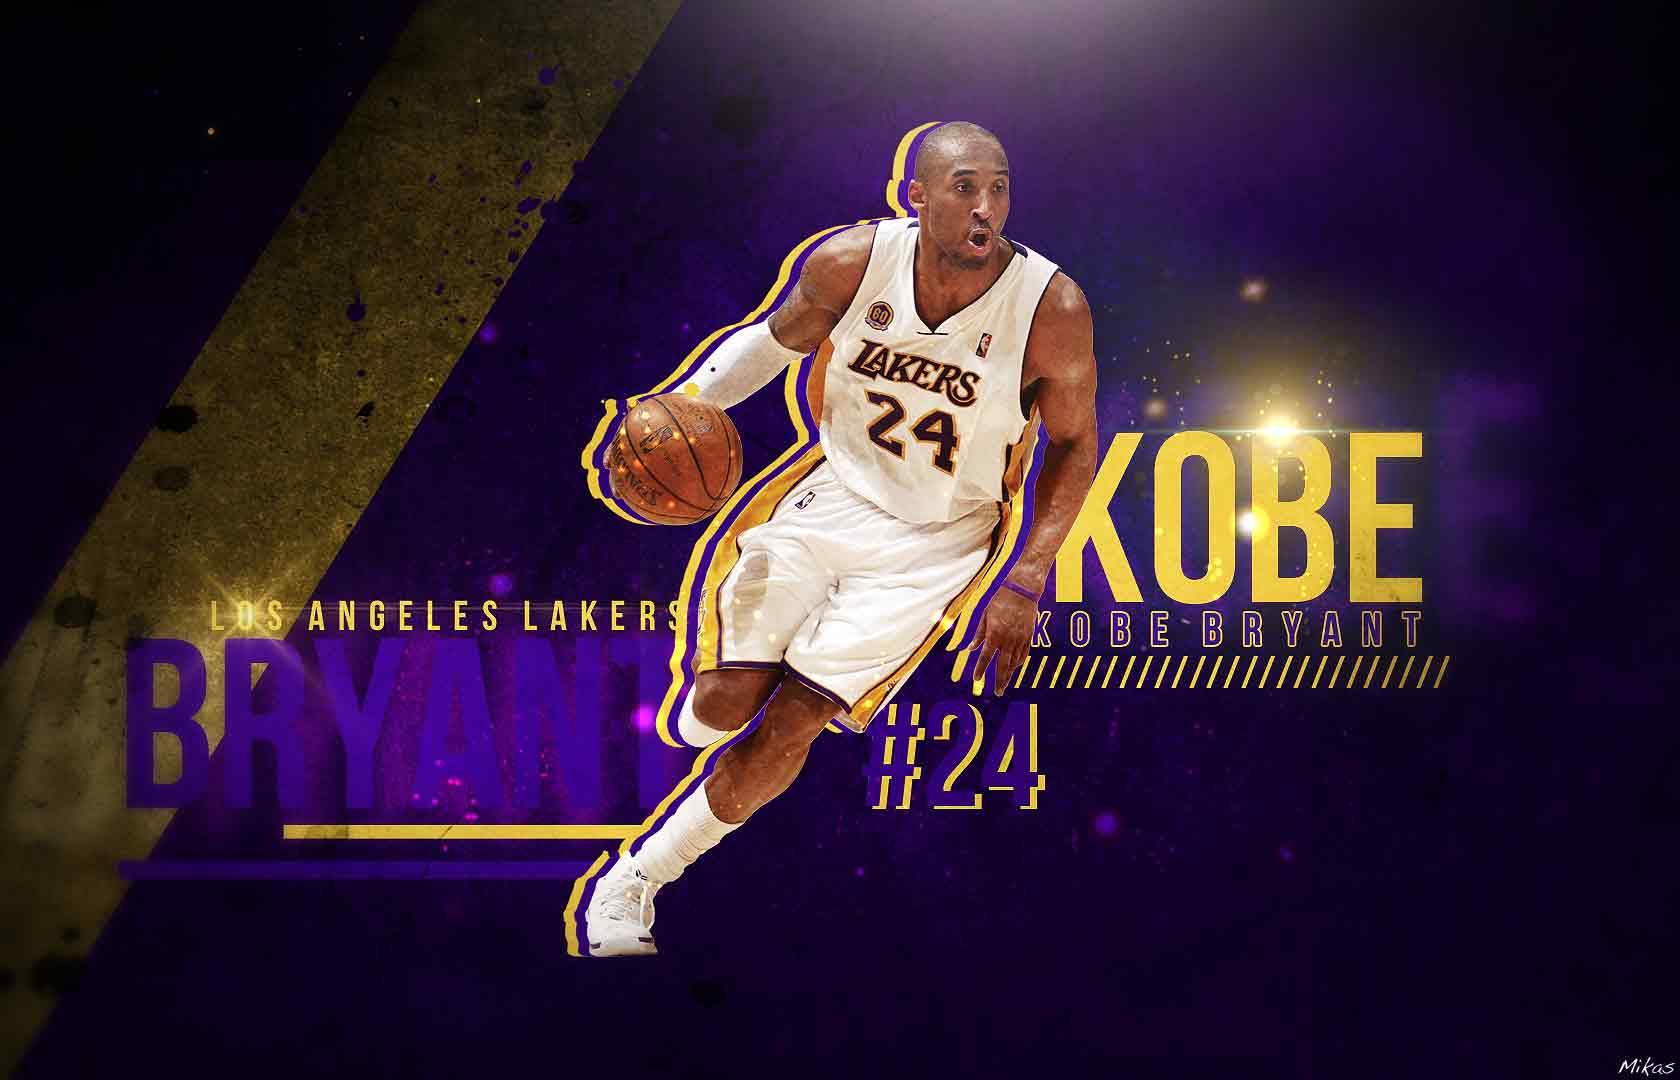 <b>Kobe Desktop Wallpaper</b>